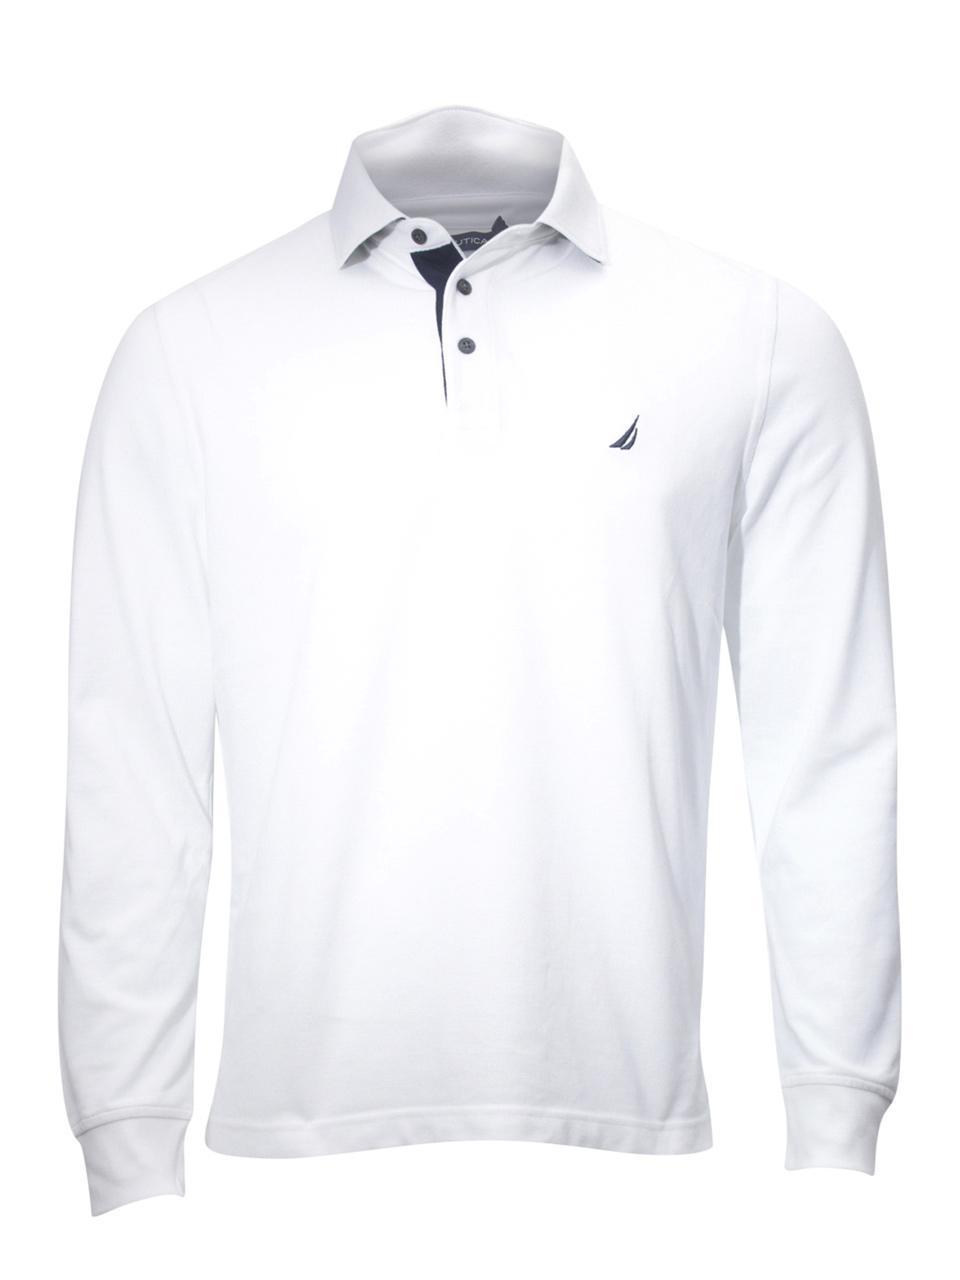 Image of - Bright White - Small